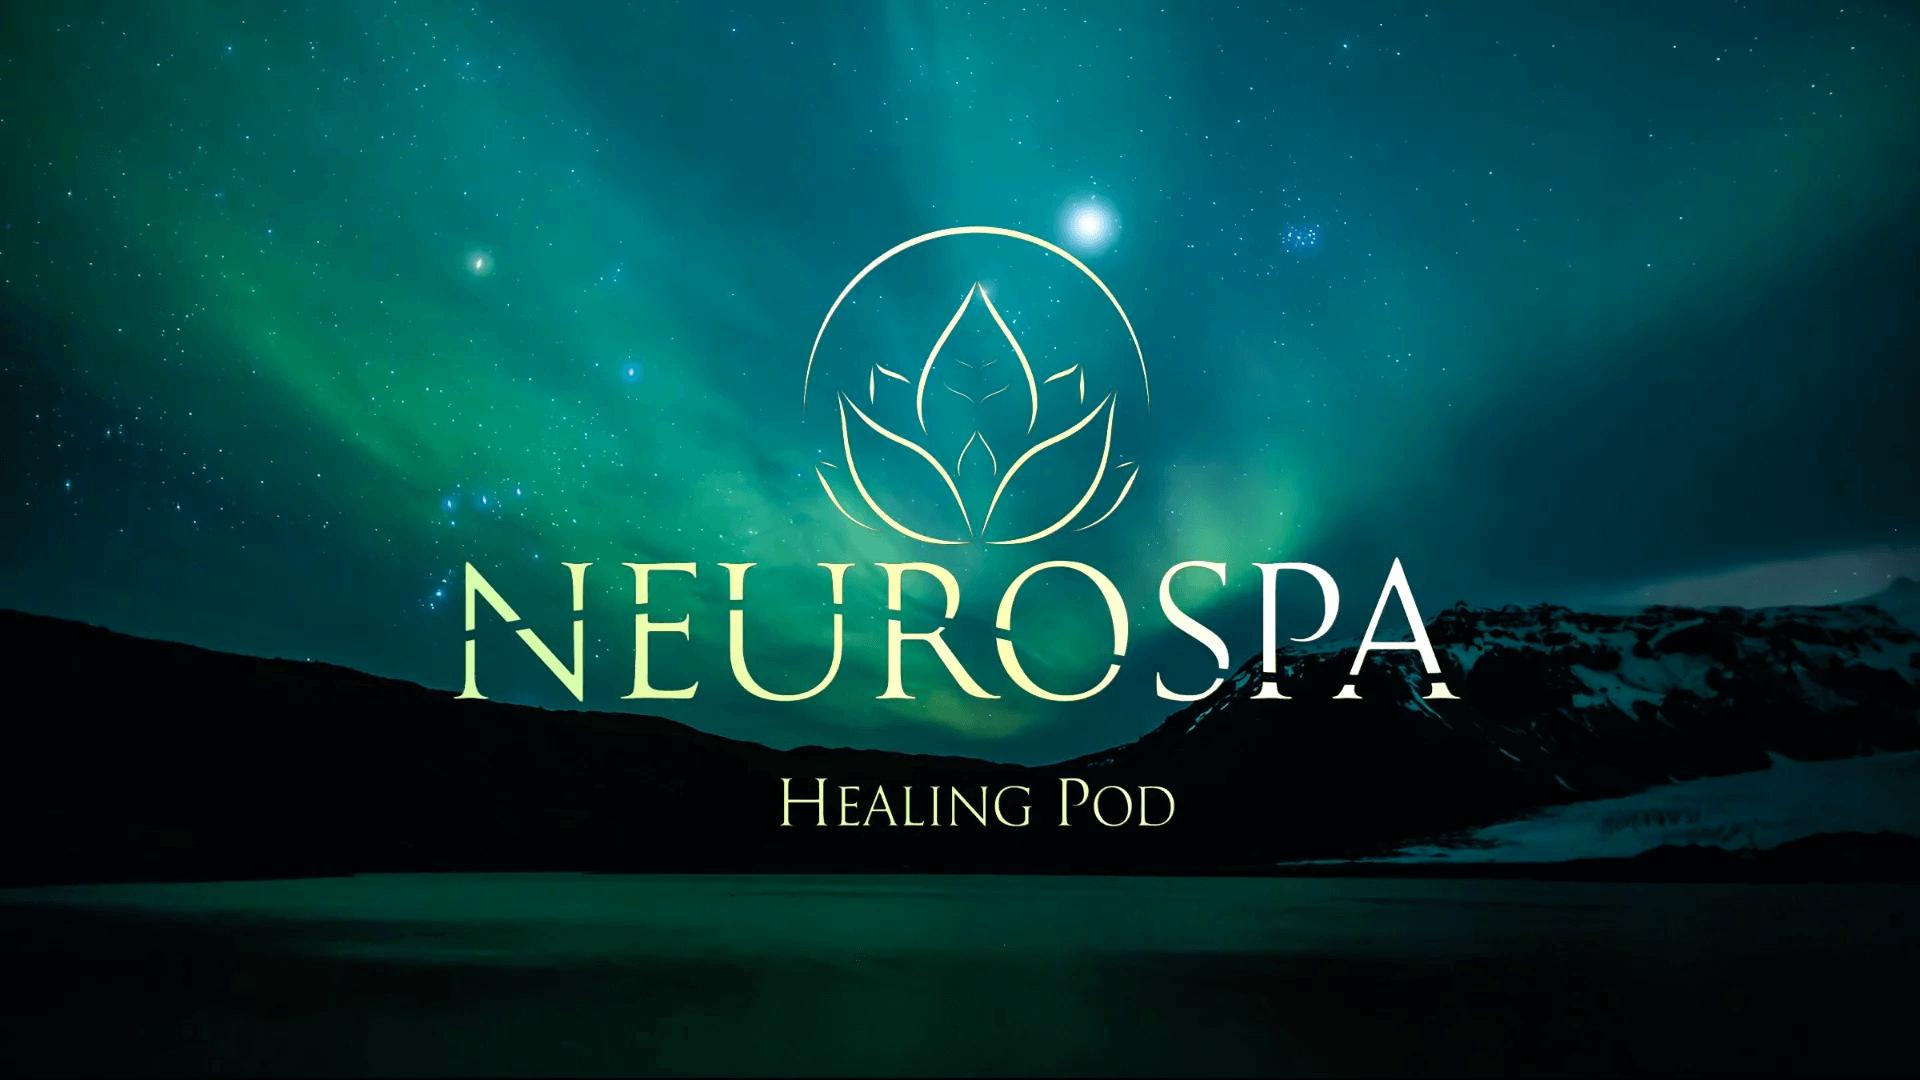 Neurospa Healing Pod